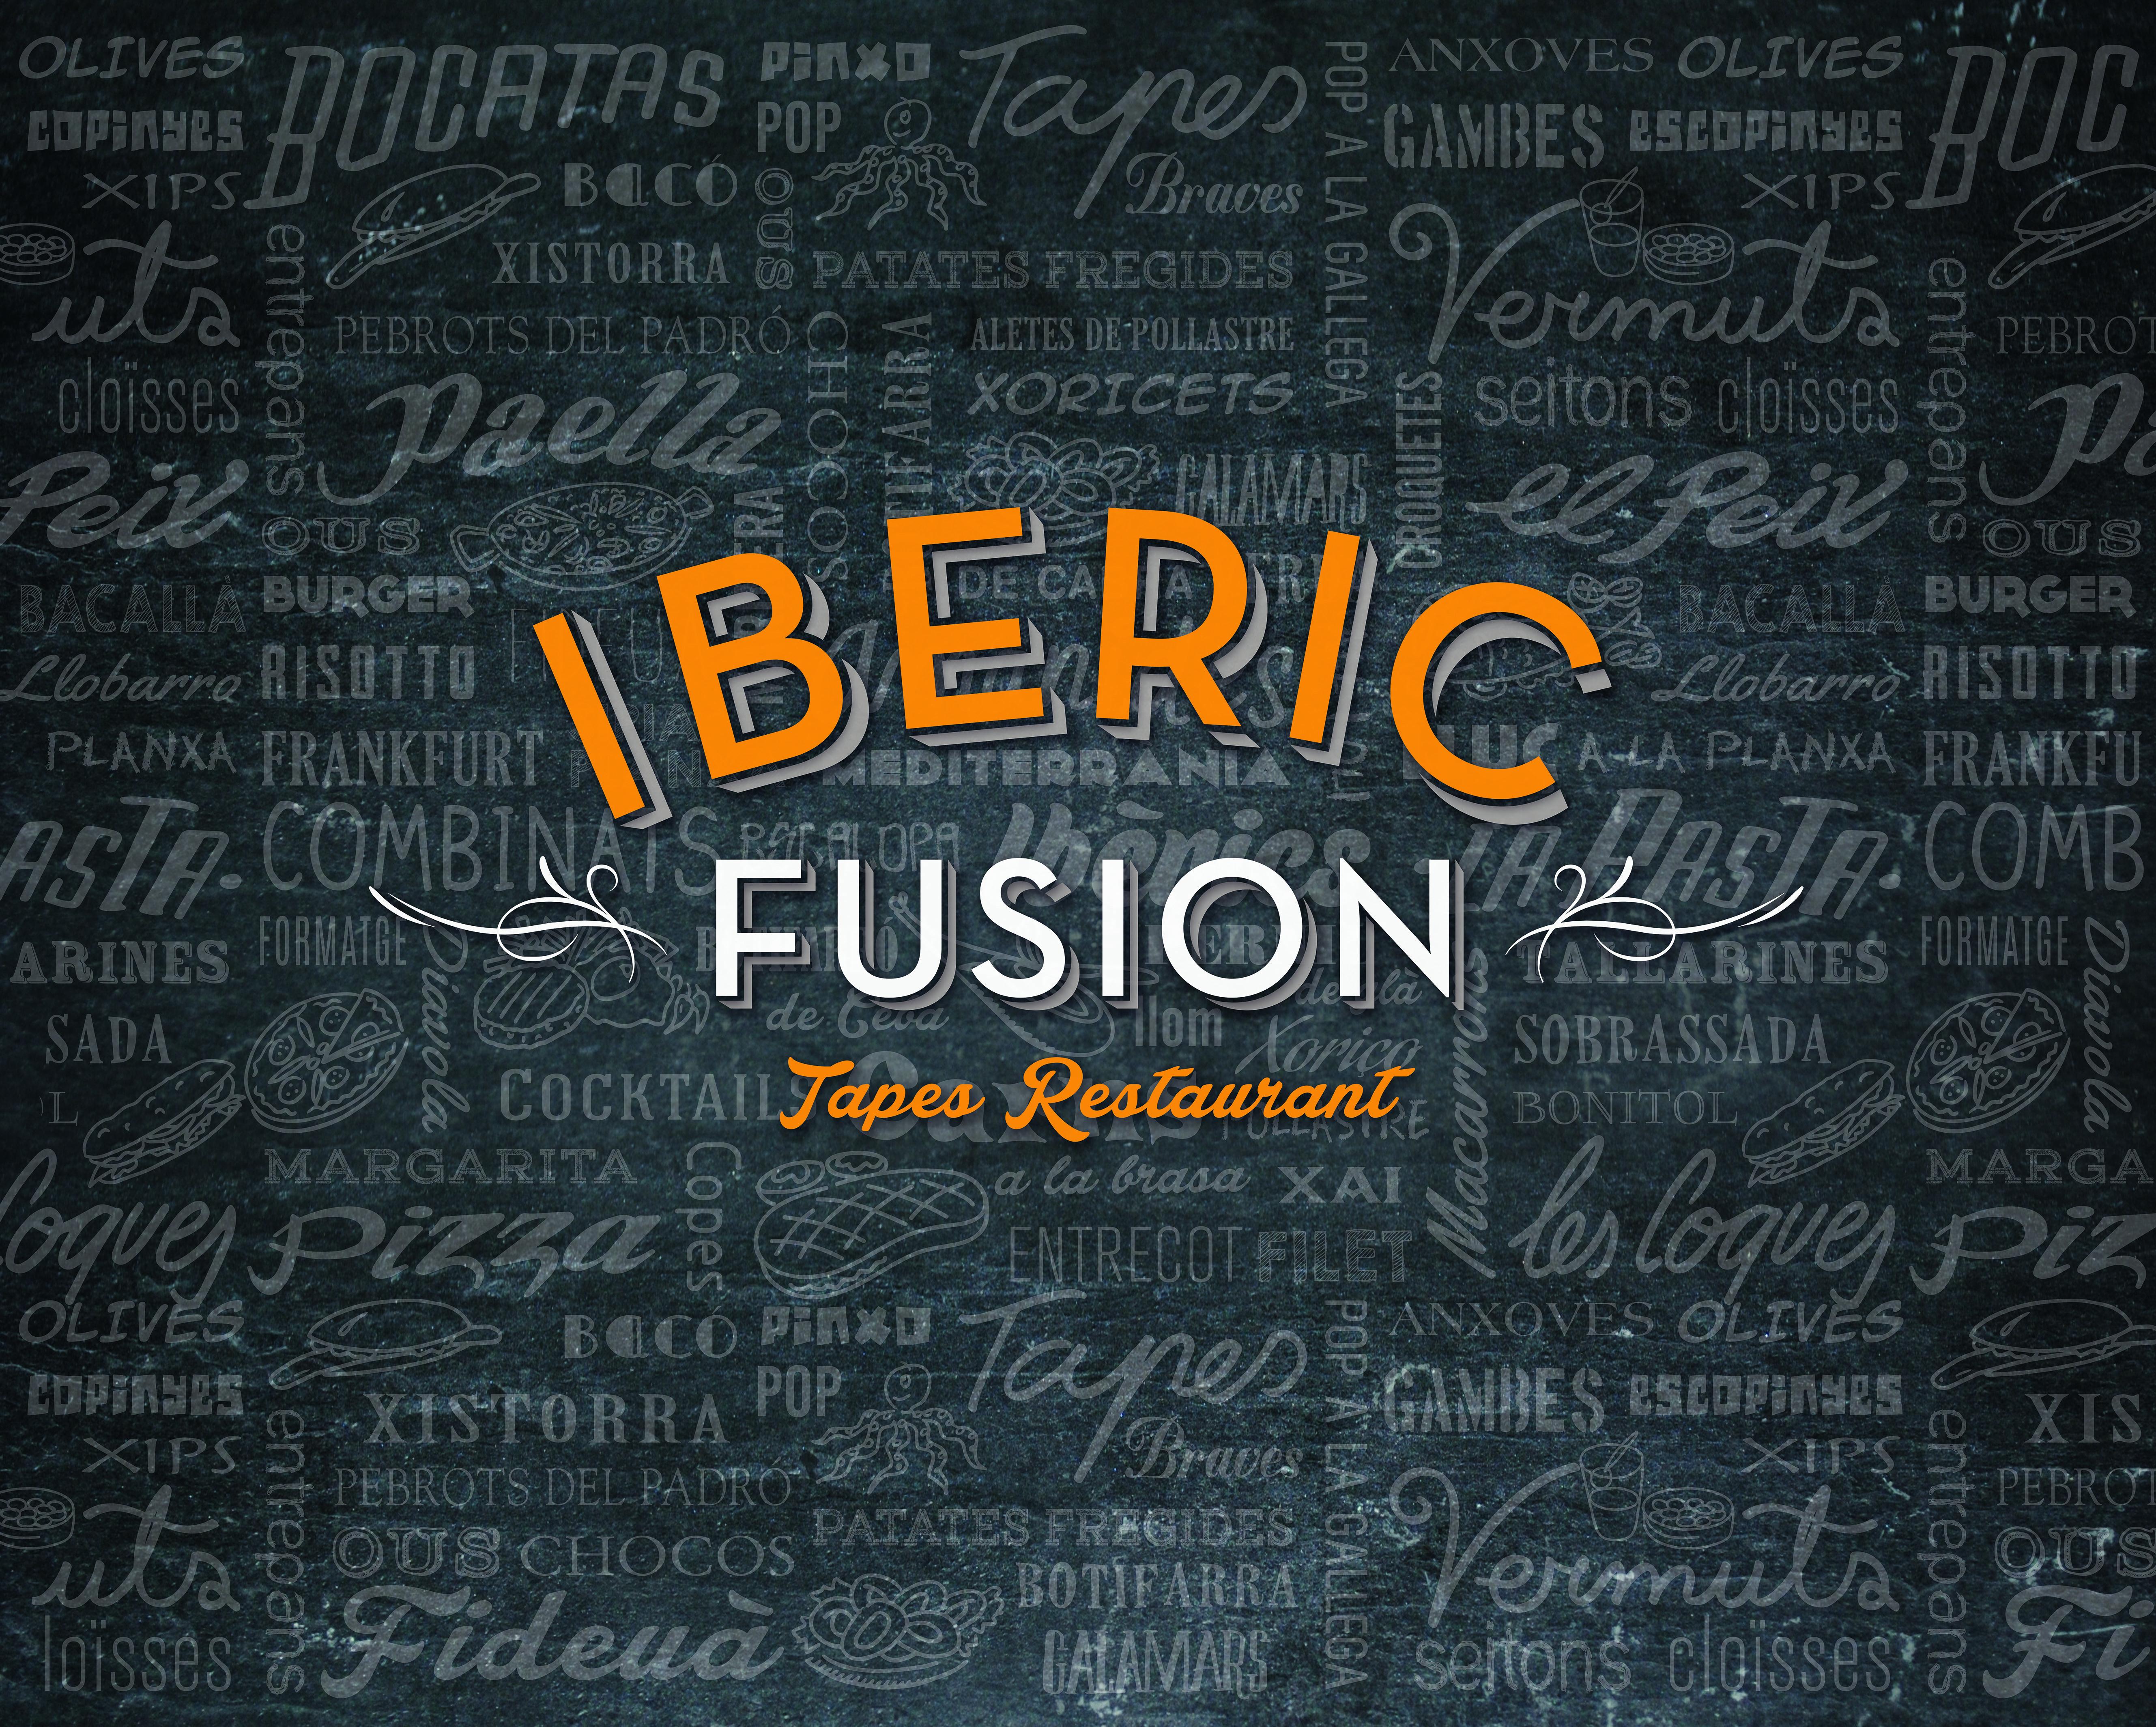 Iberic Fusion